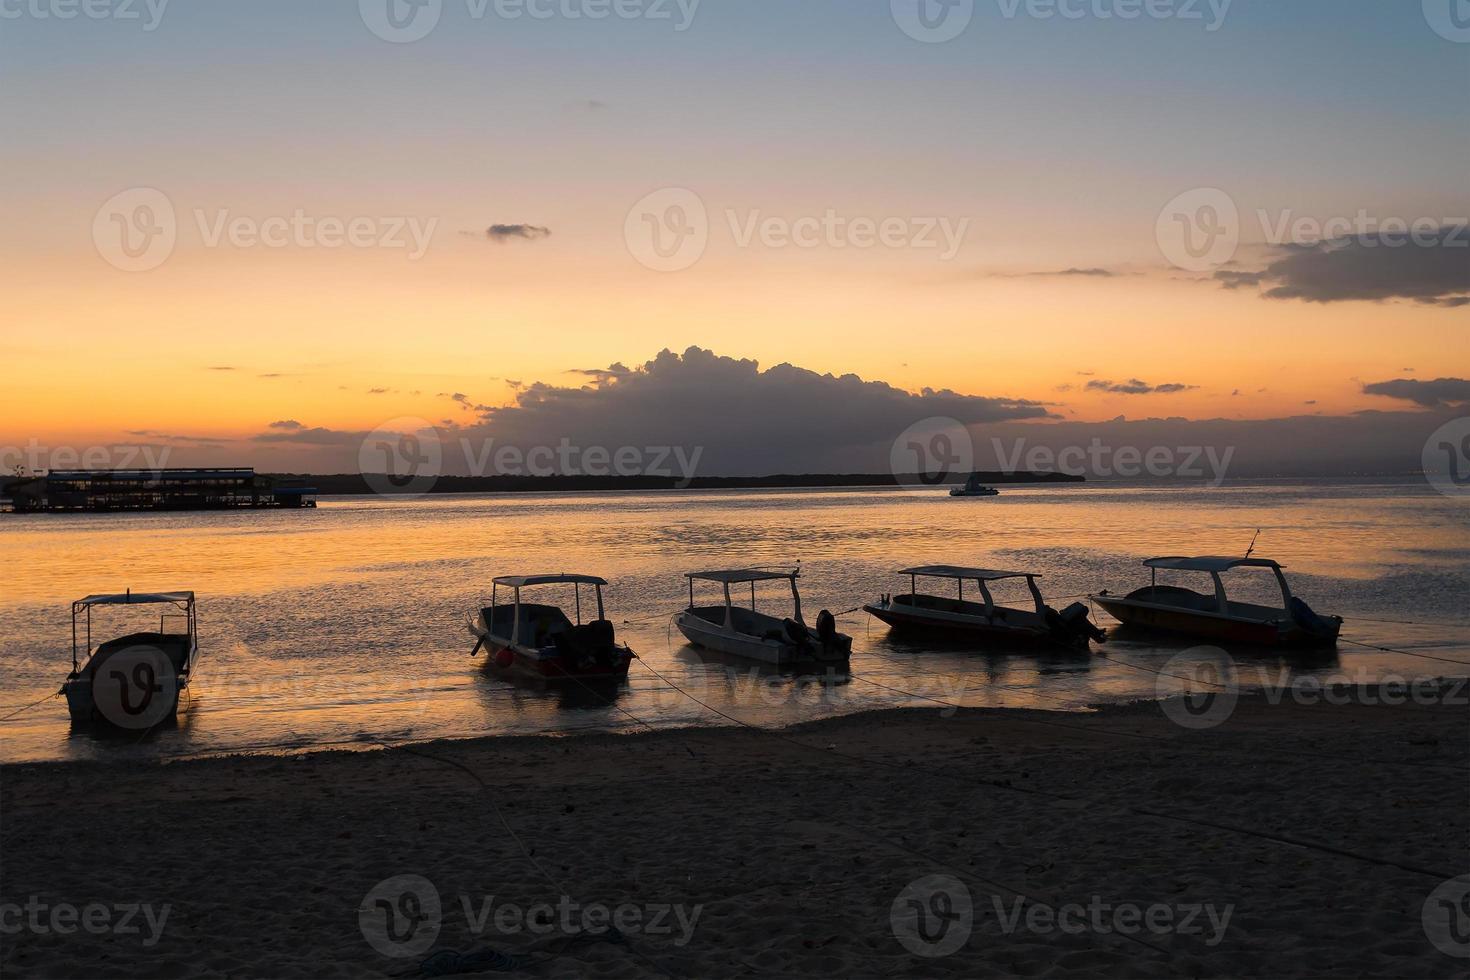 Nusa penida, Bali beach with dramatic sky and sunset photo